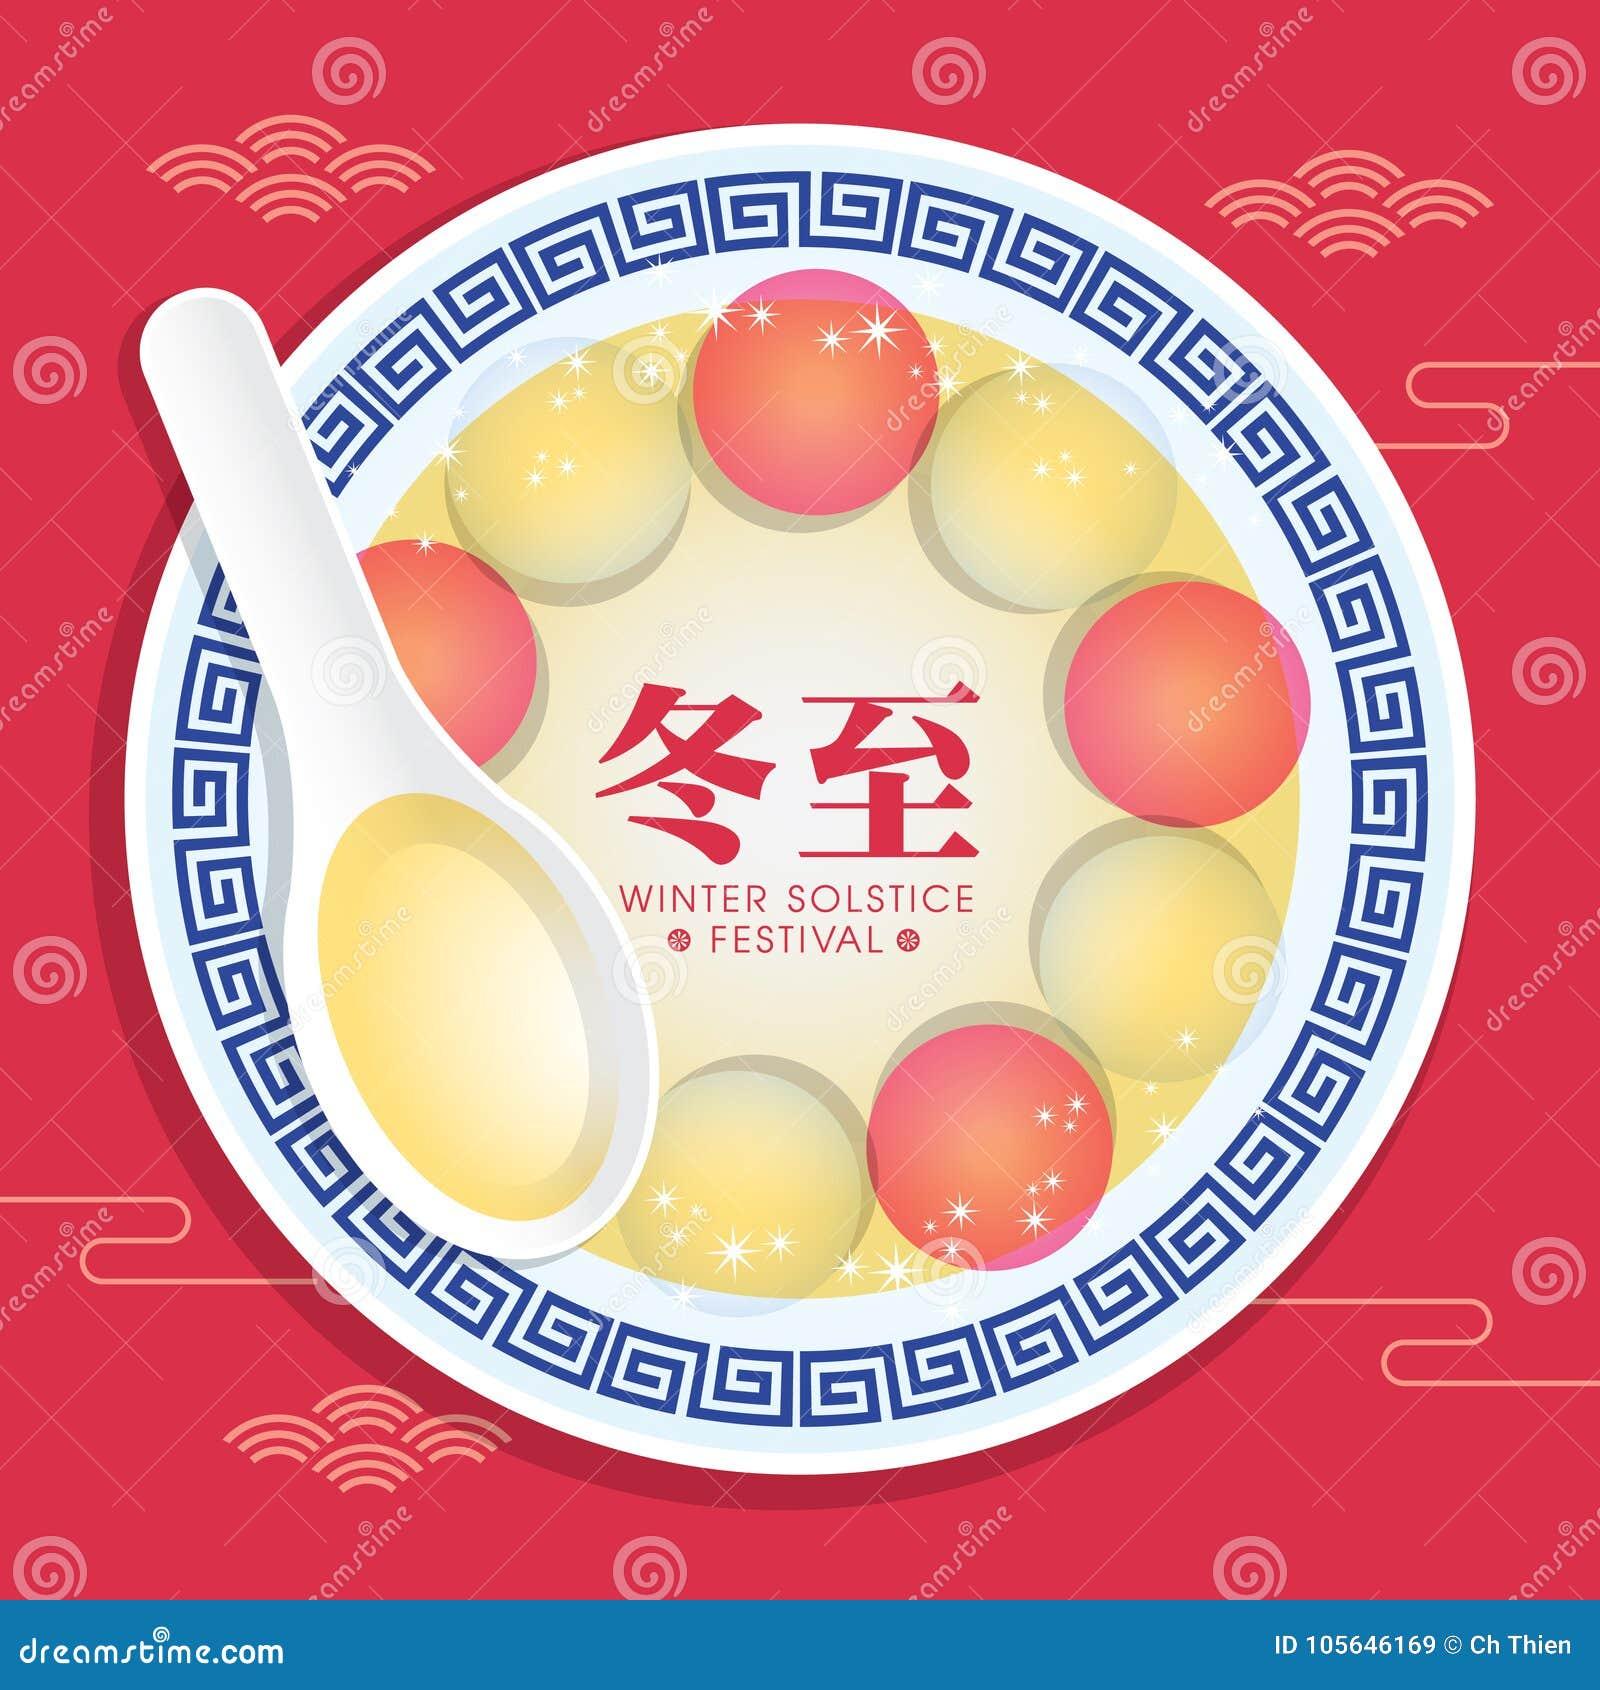 Zhi Means Winter Solstice Festiva Tangyuan Sweet Dumplings Serve